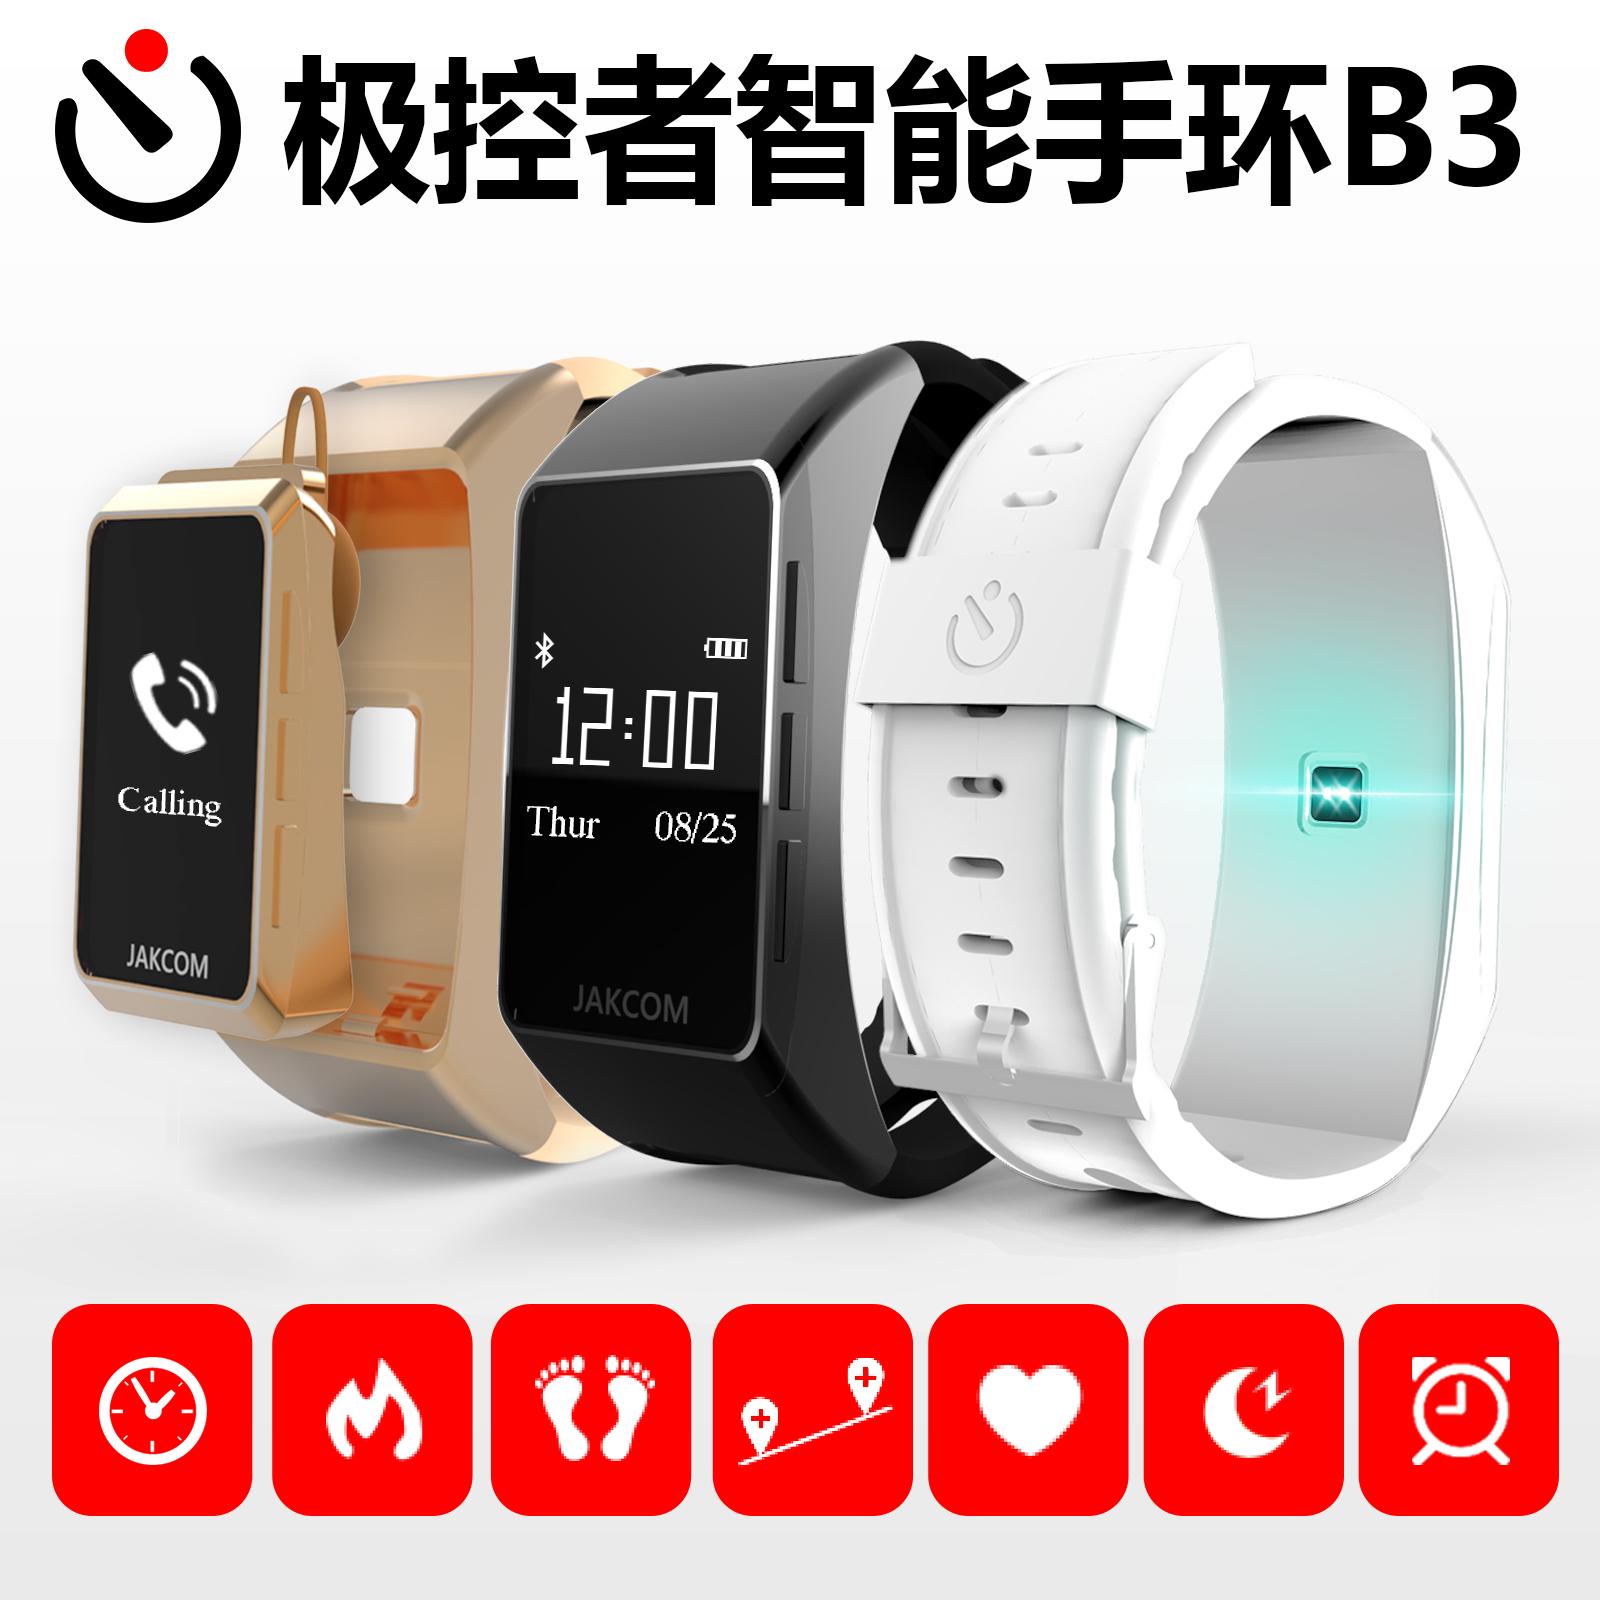 B3运动智能手环蓝牙耳机二合一分离式可通话计步防水计步心率手表